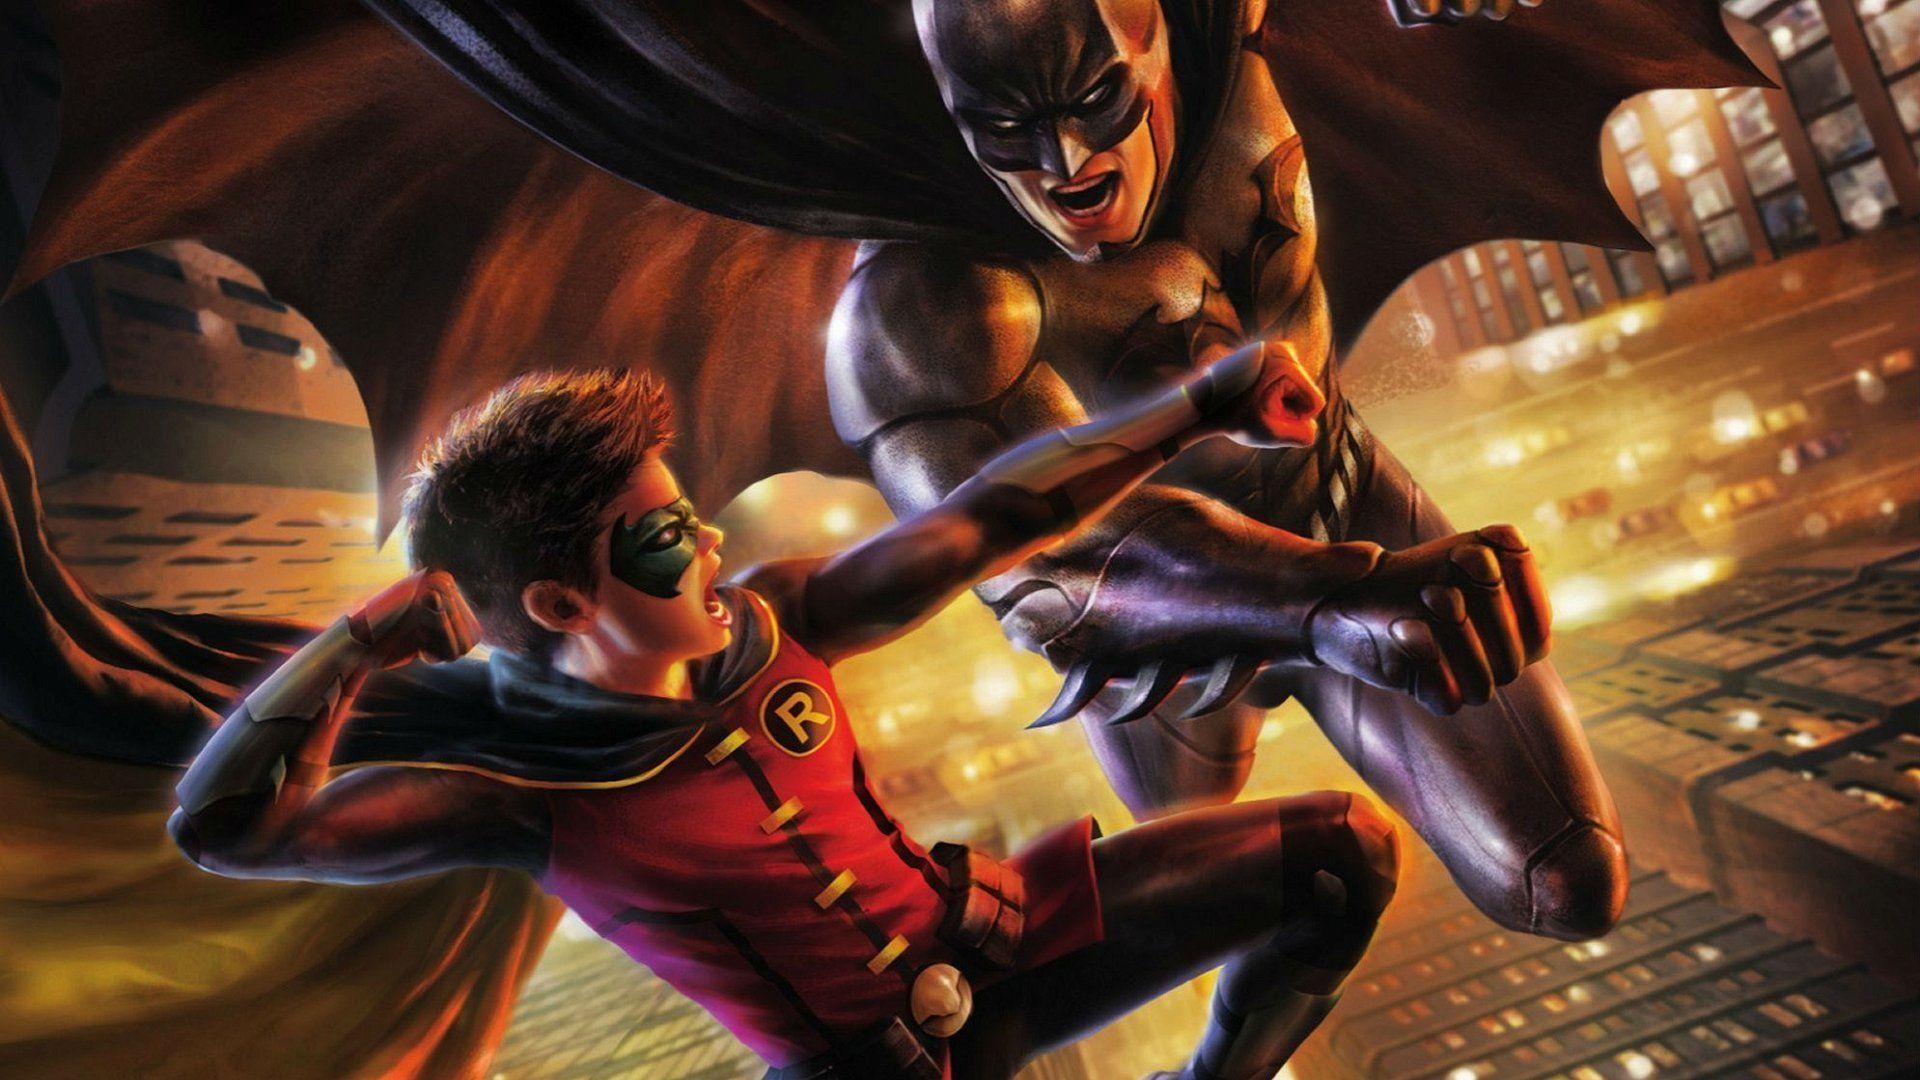 2 Batman Vs. Robin HD Wallpapers | Backgrounds - Wallpaper Abyss